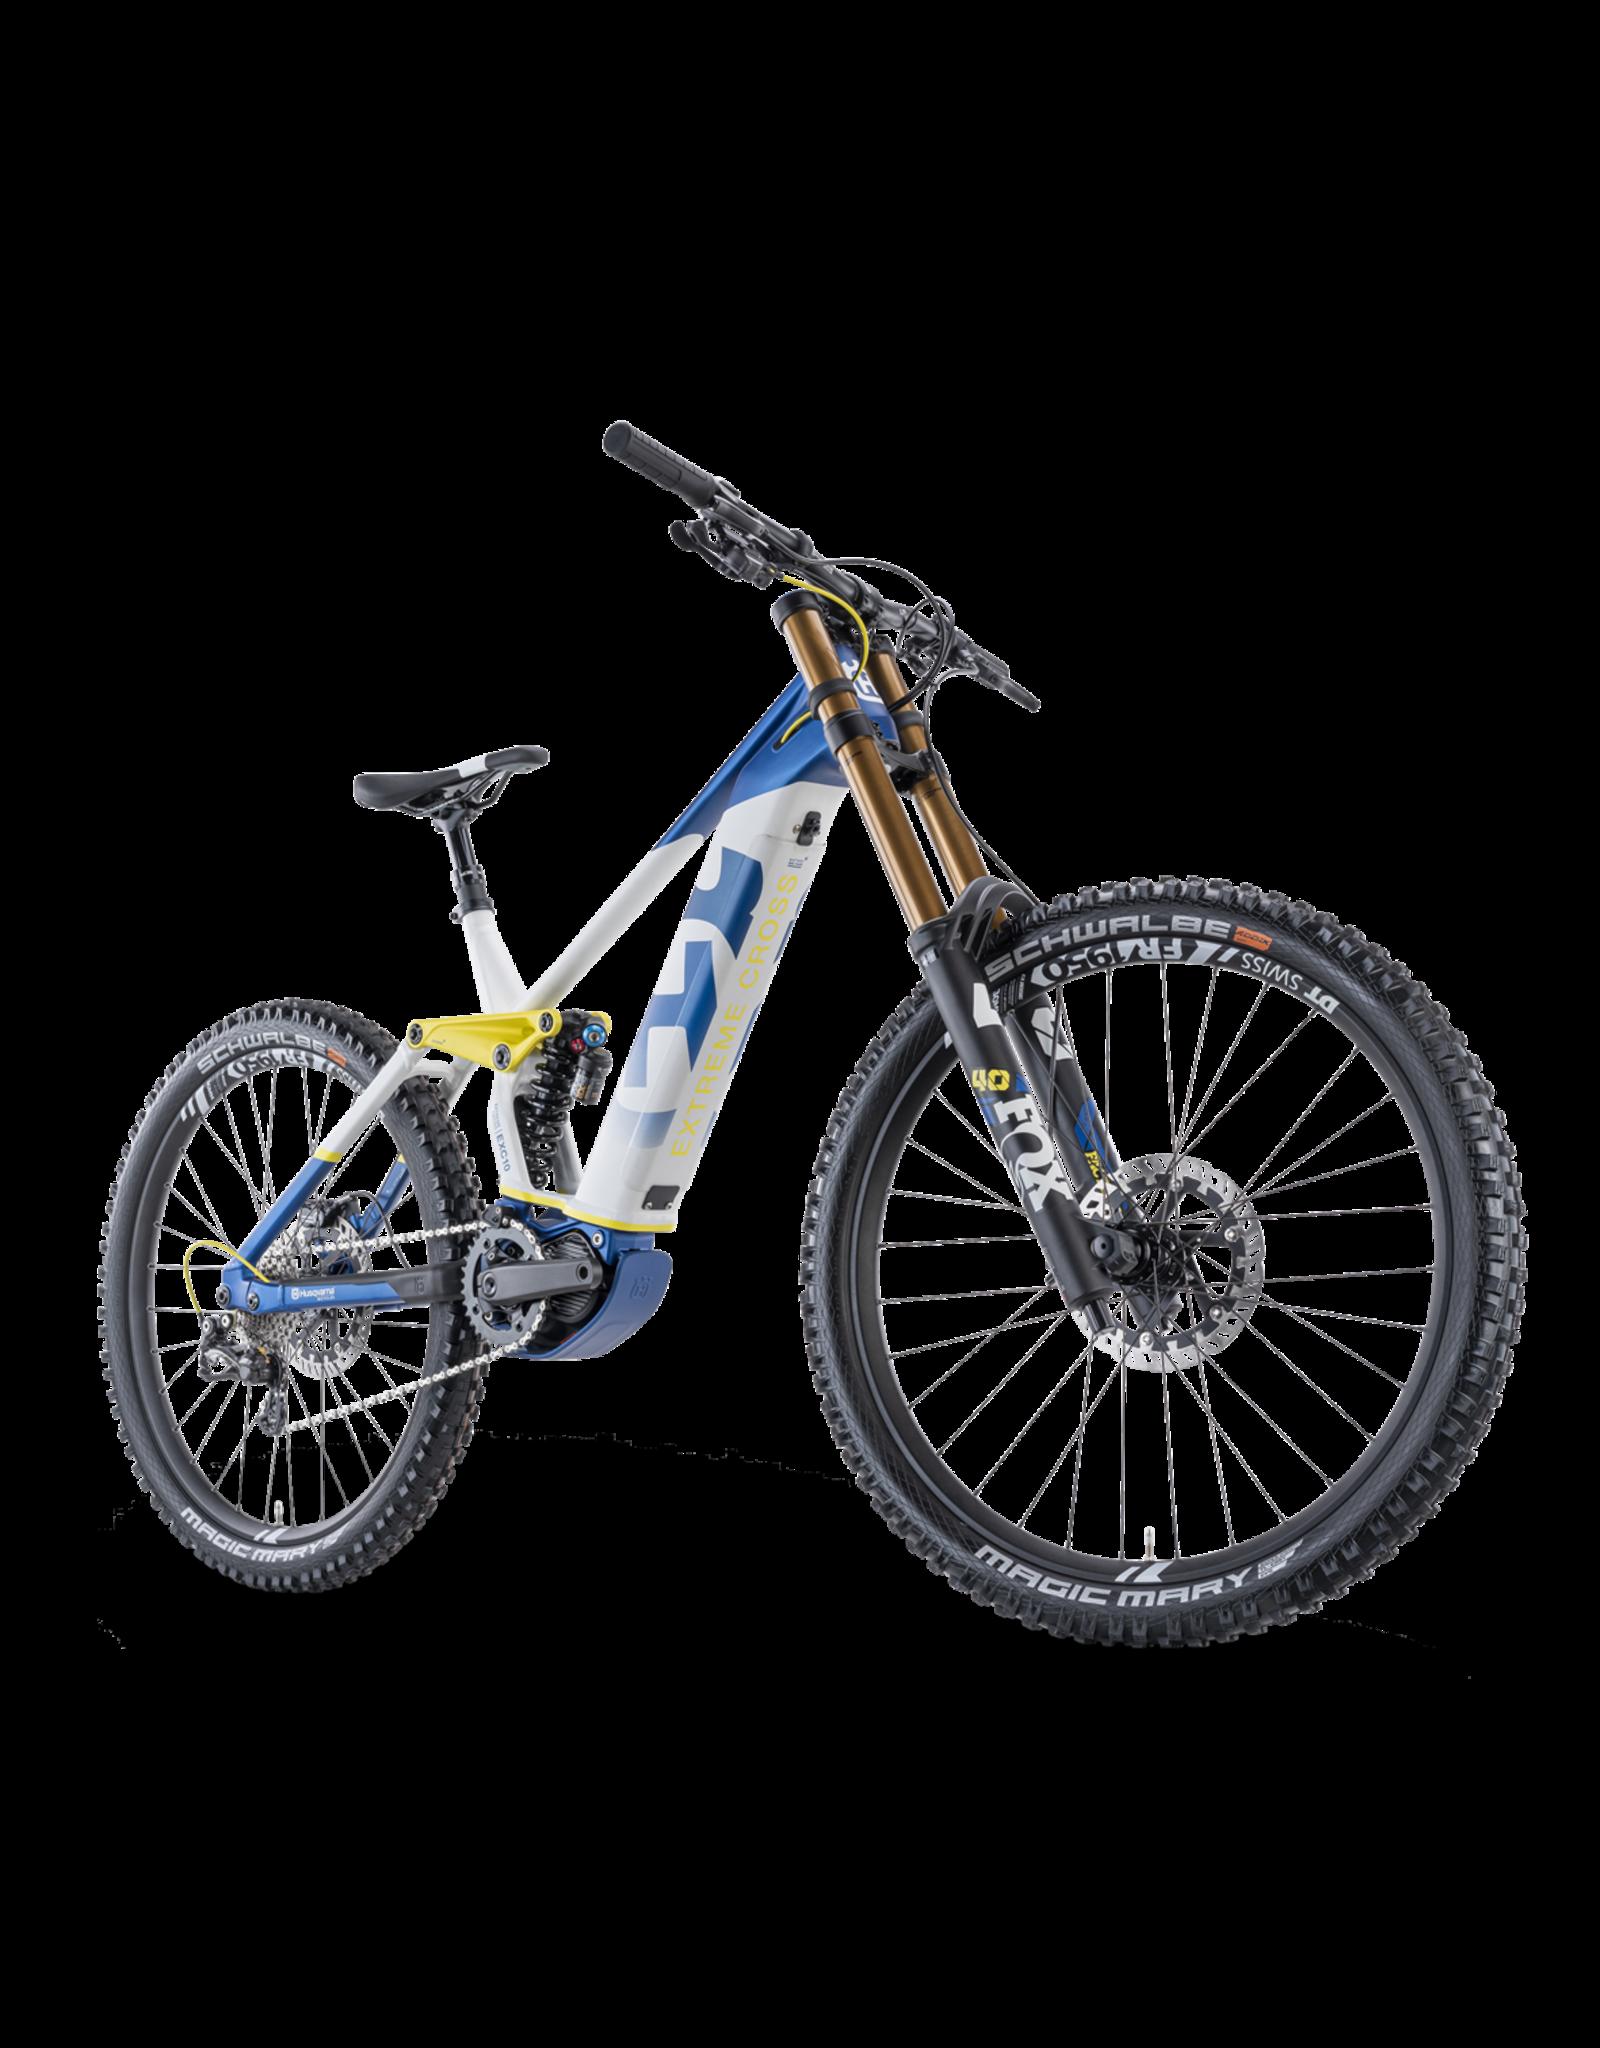 HUSQVARNA Bicycles Husqvarna Bicycles - Extreme Cross 10 - EXC10